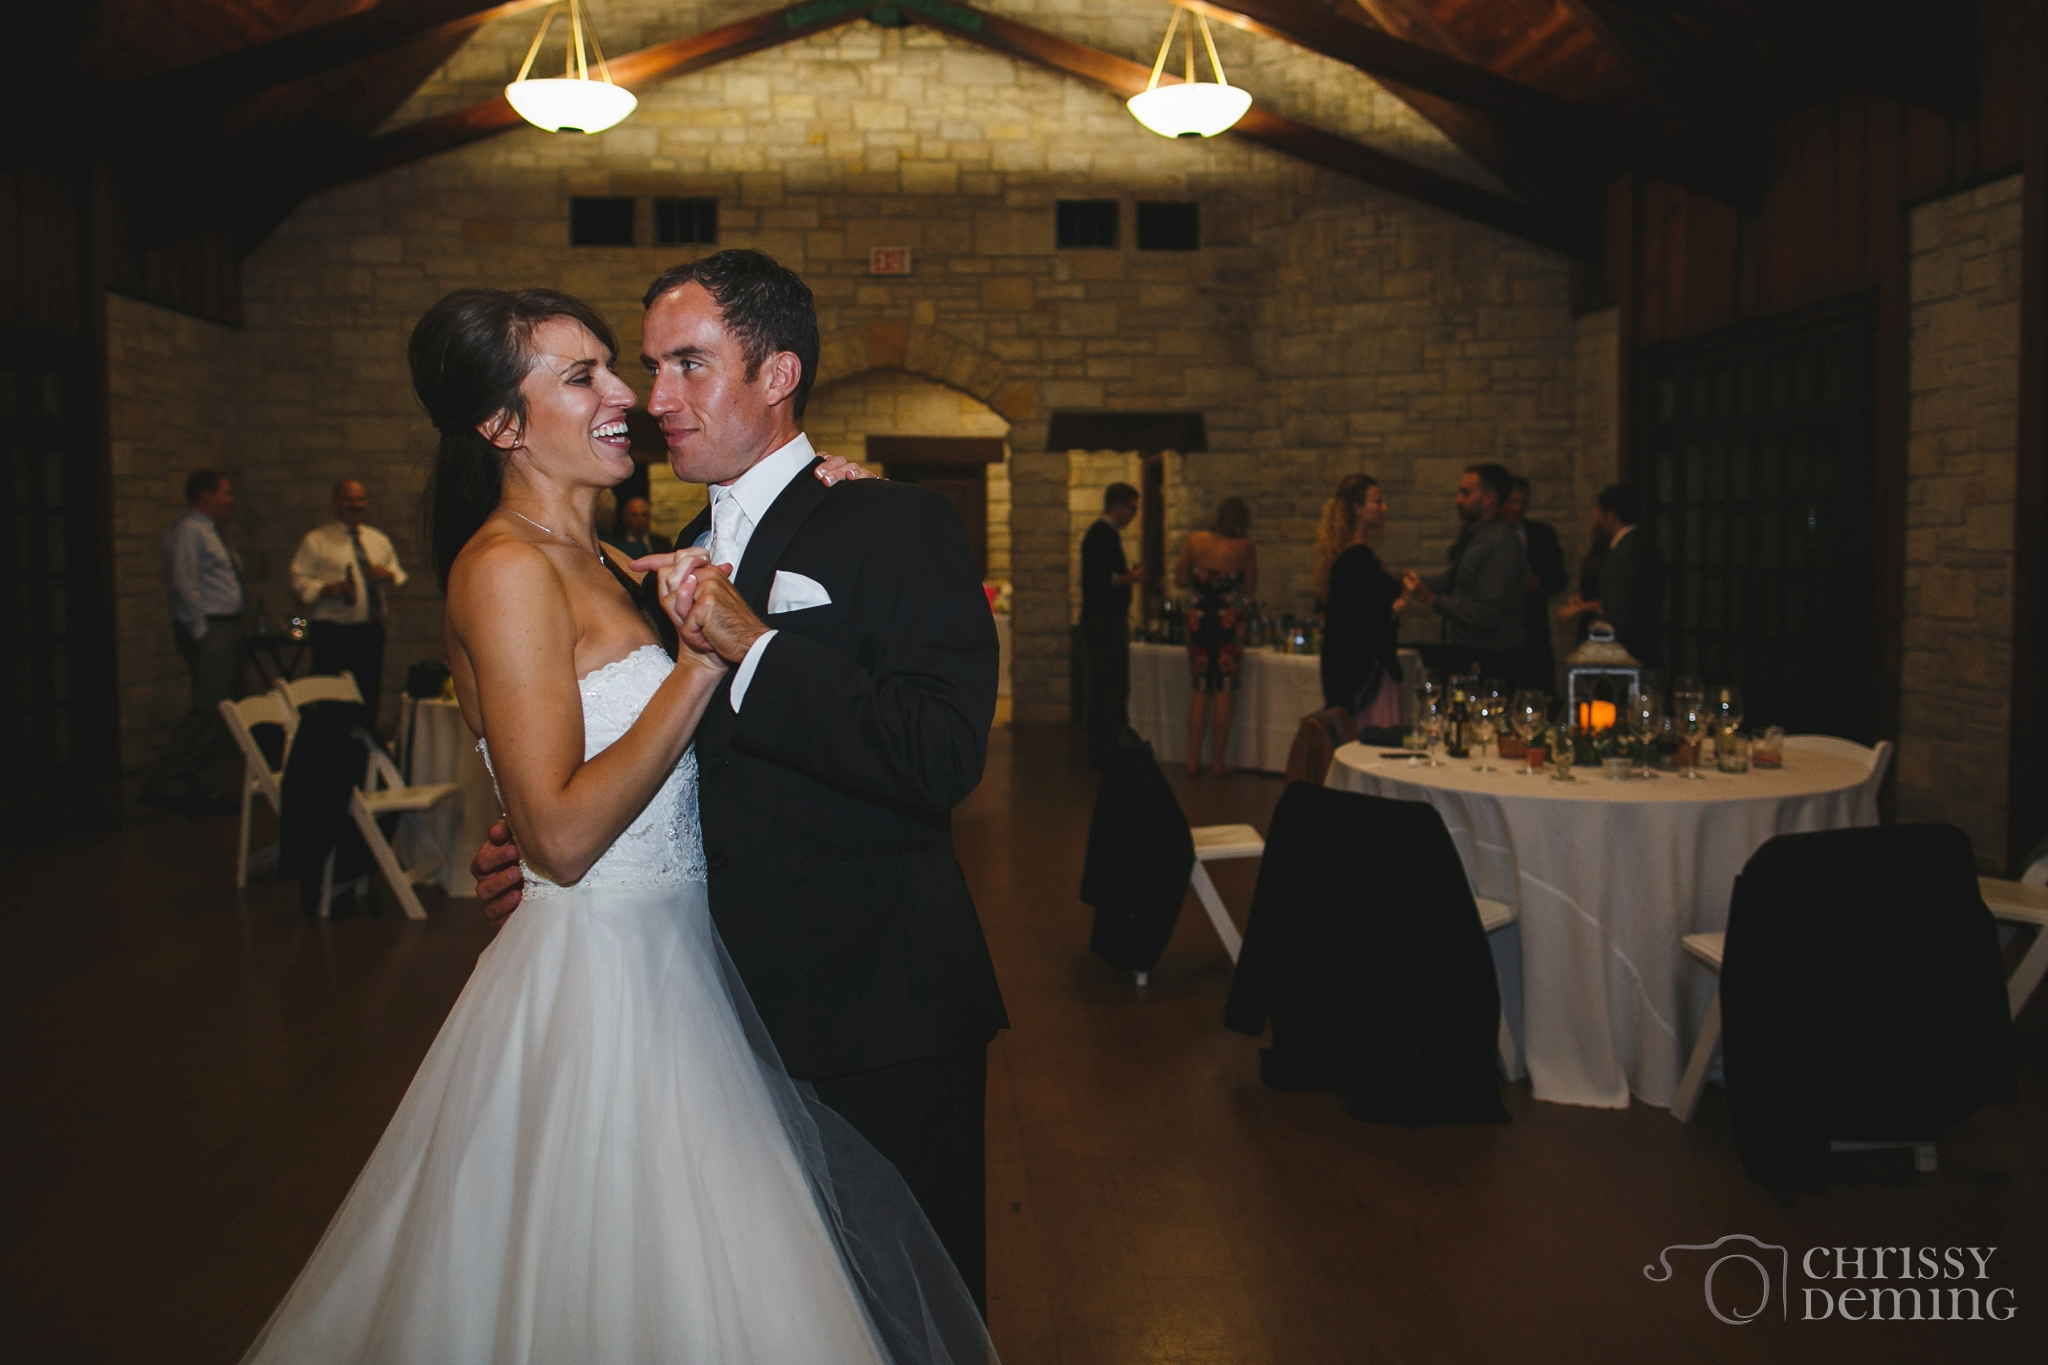 promontory_point_chicago_wedding_photography_0037.jpg